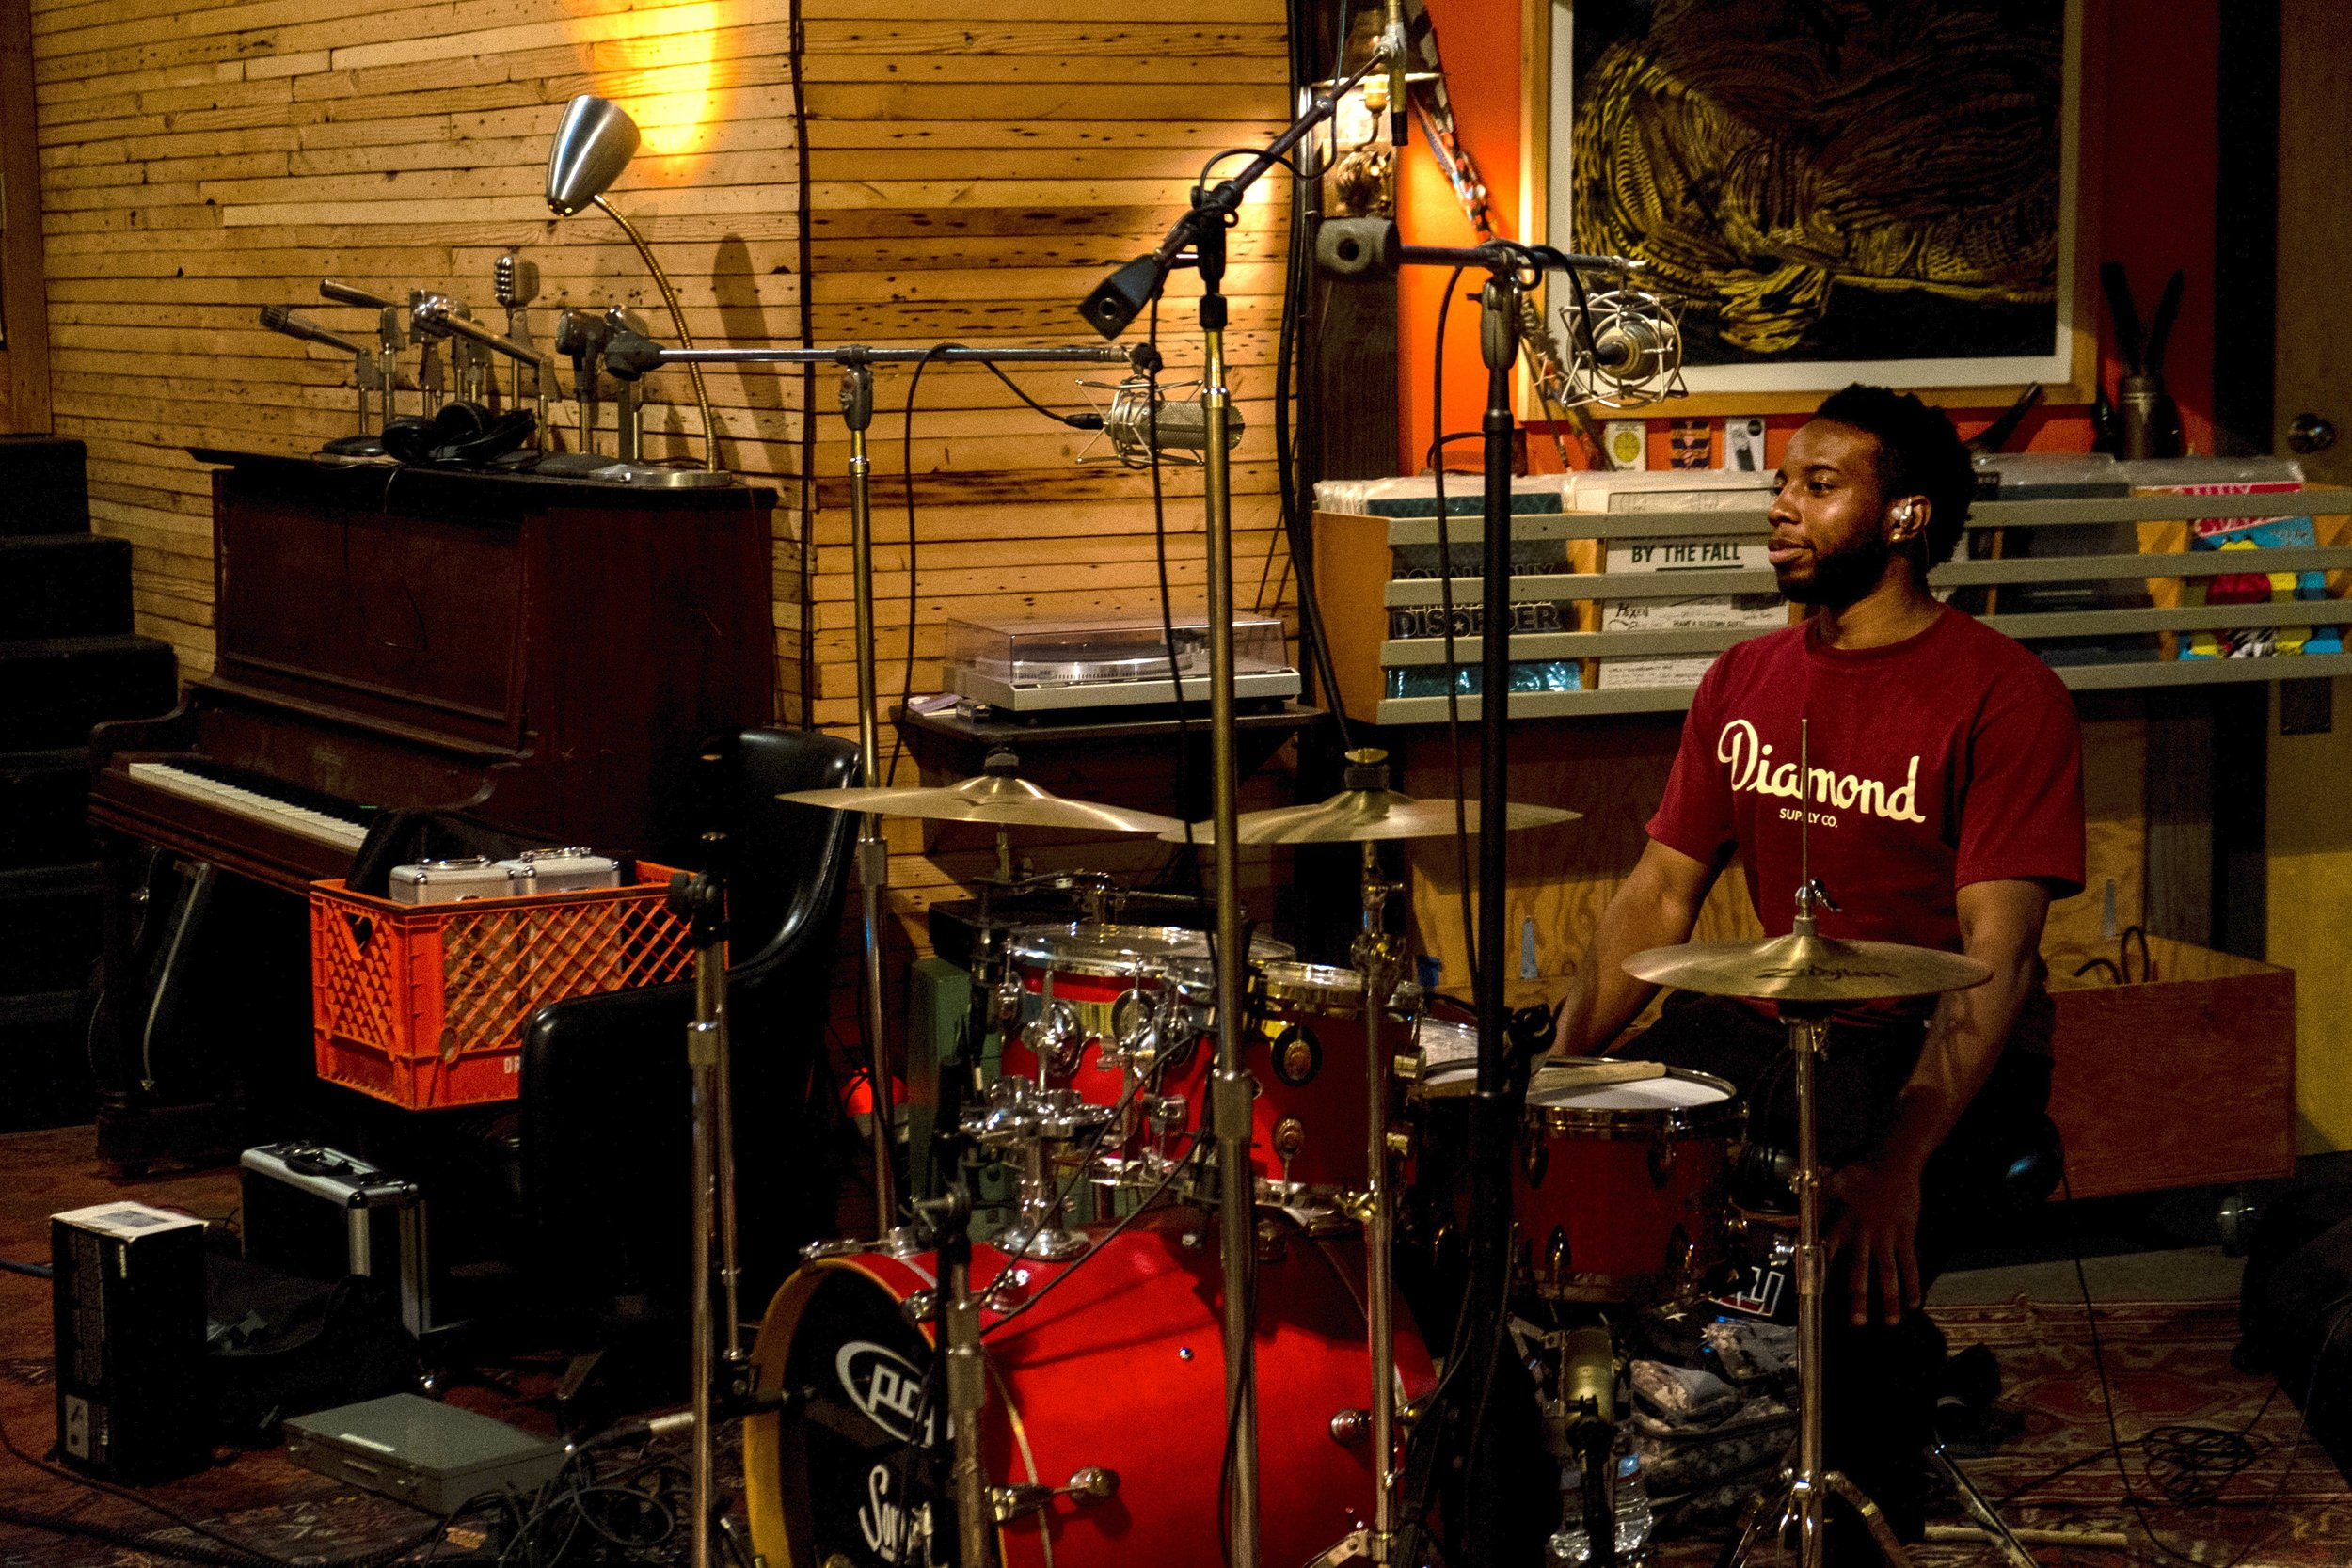 brandon drums.jpg